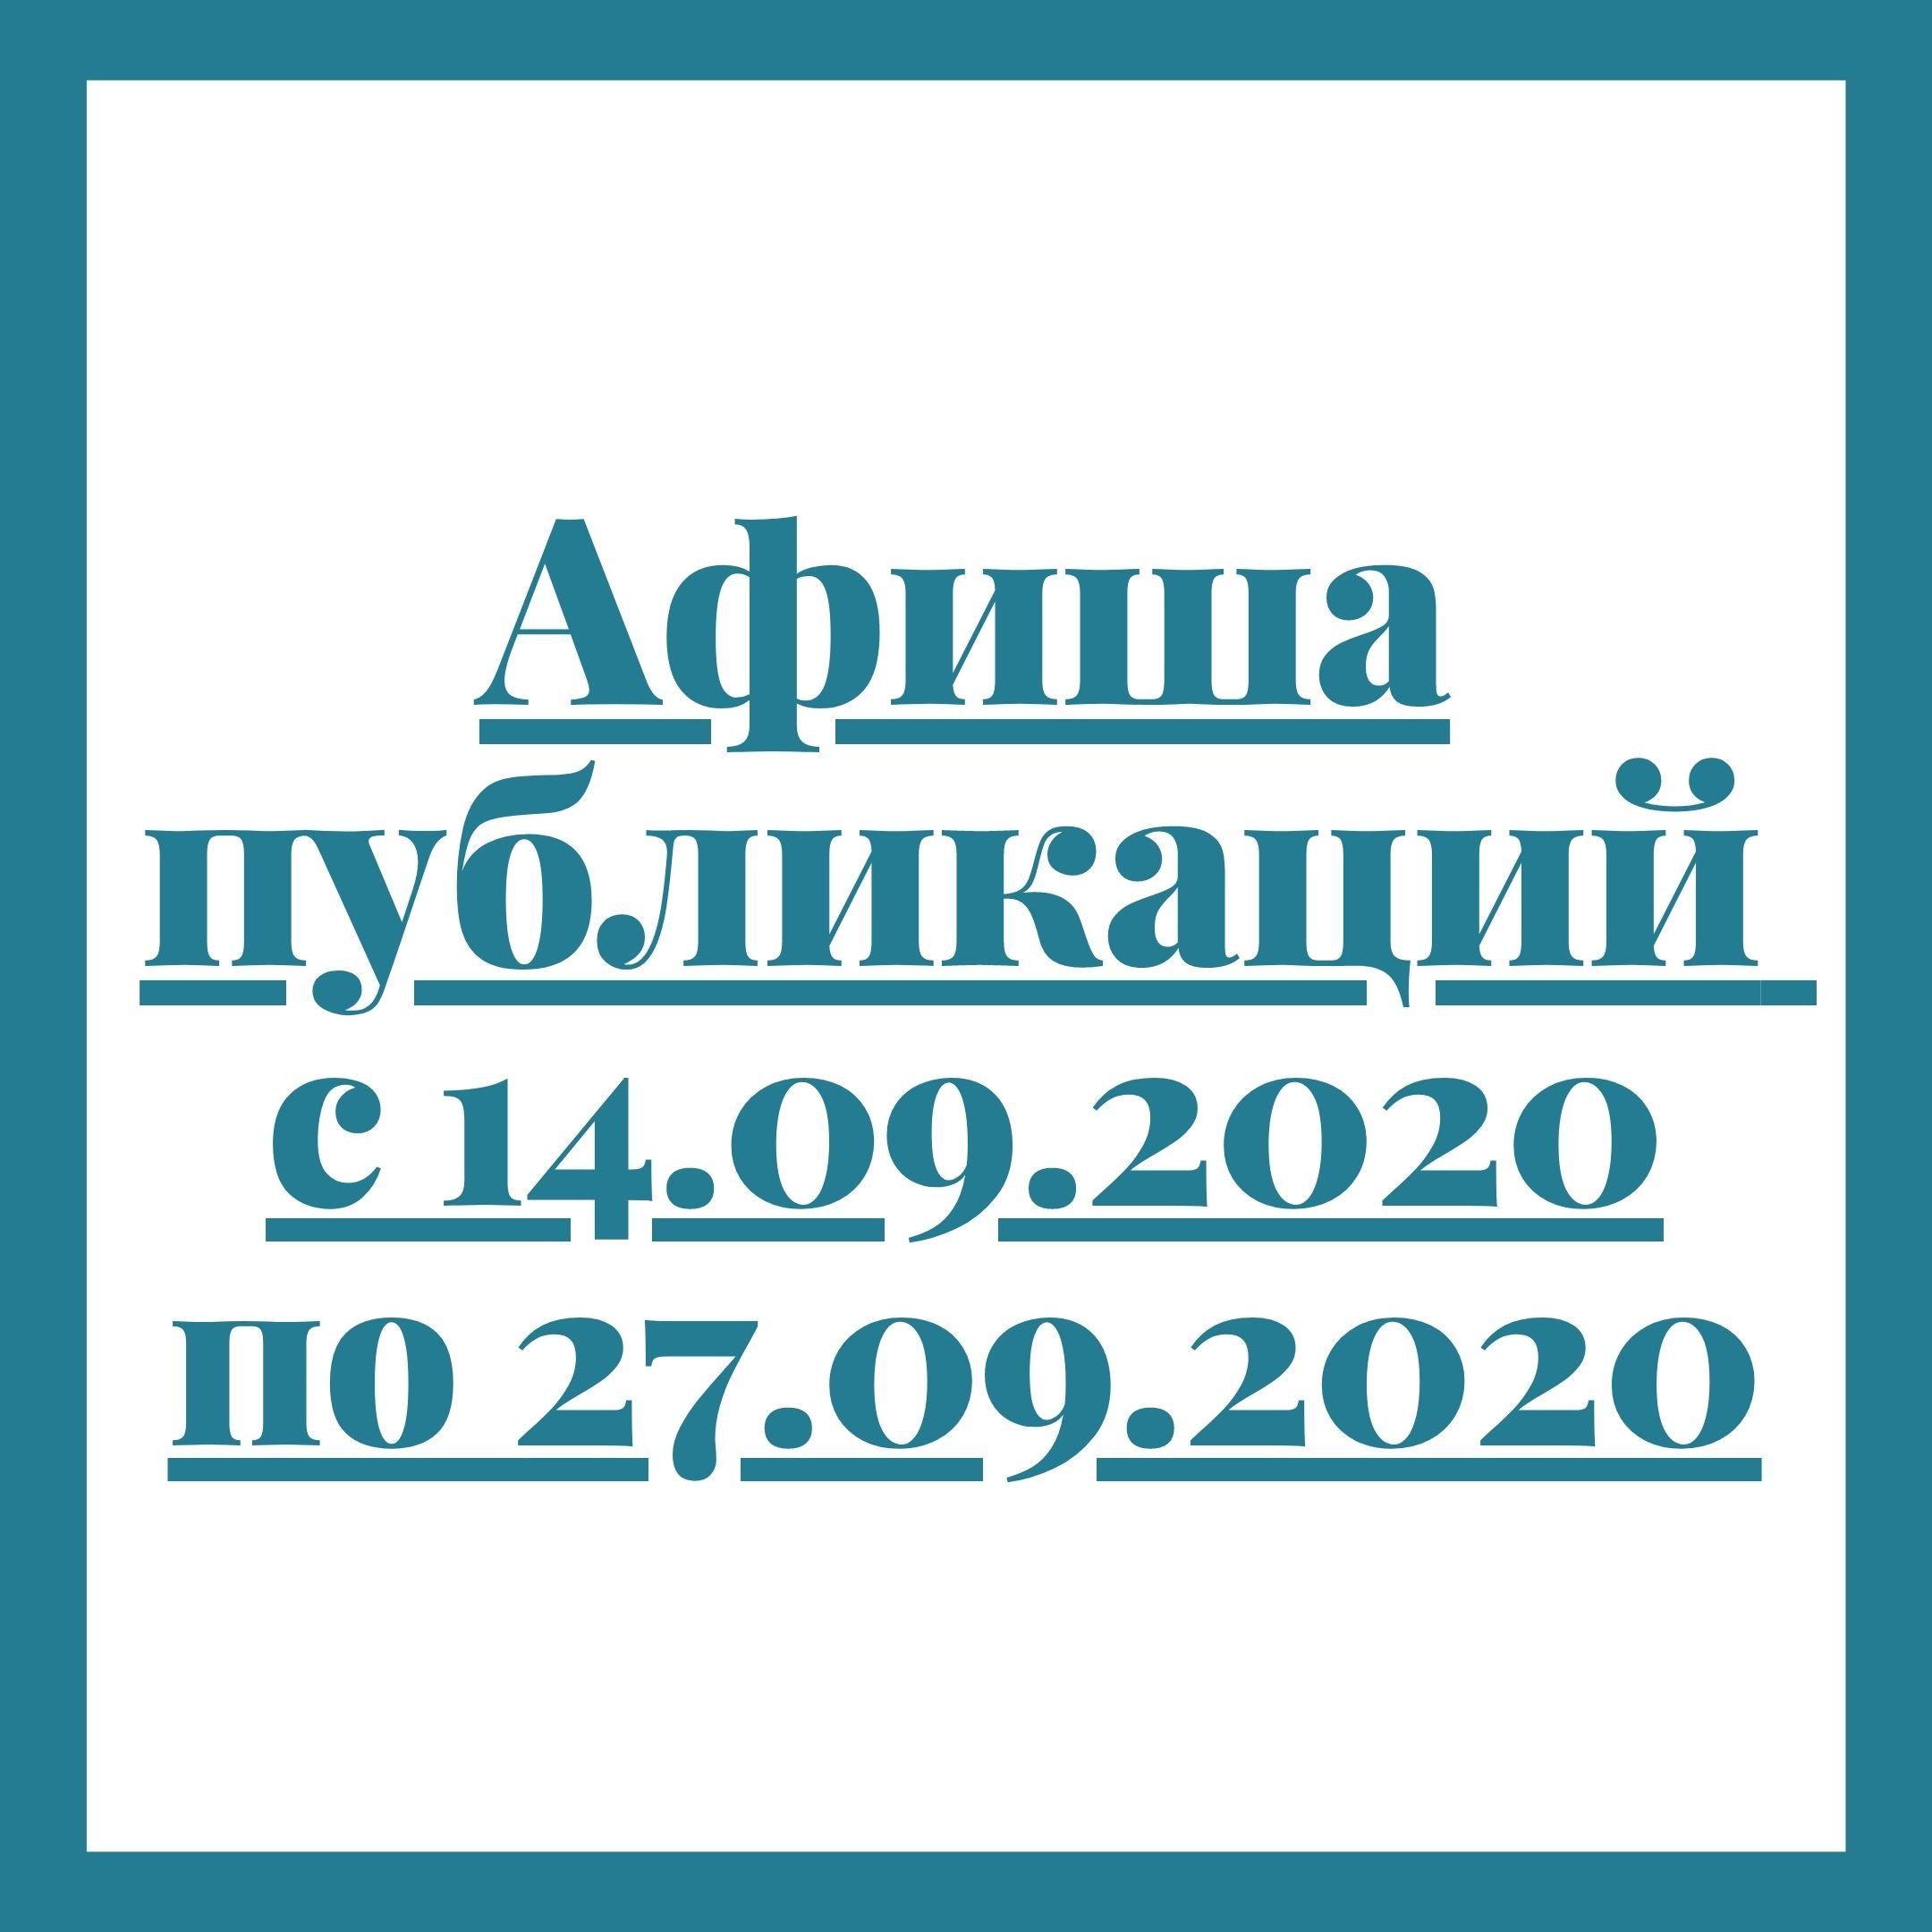 Афиша публикаций с 14.09.2020 по 27.09.2020